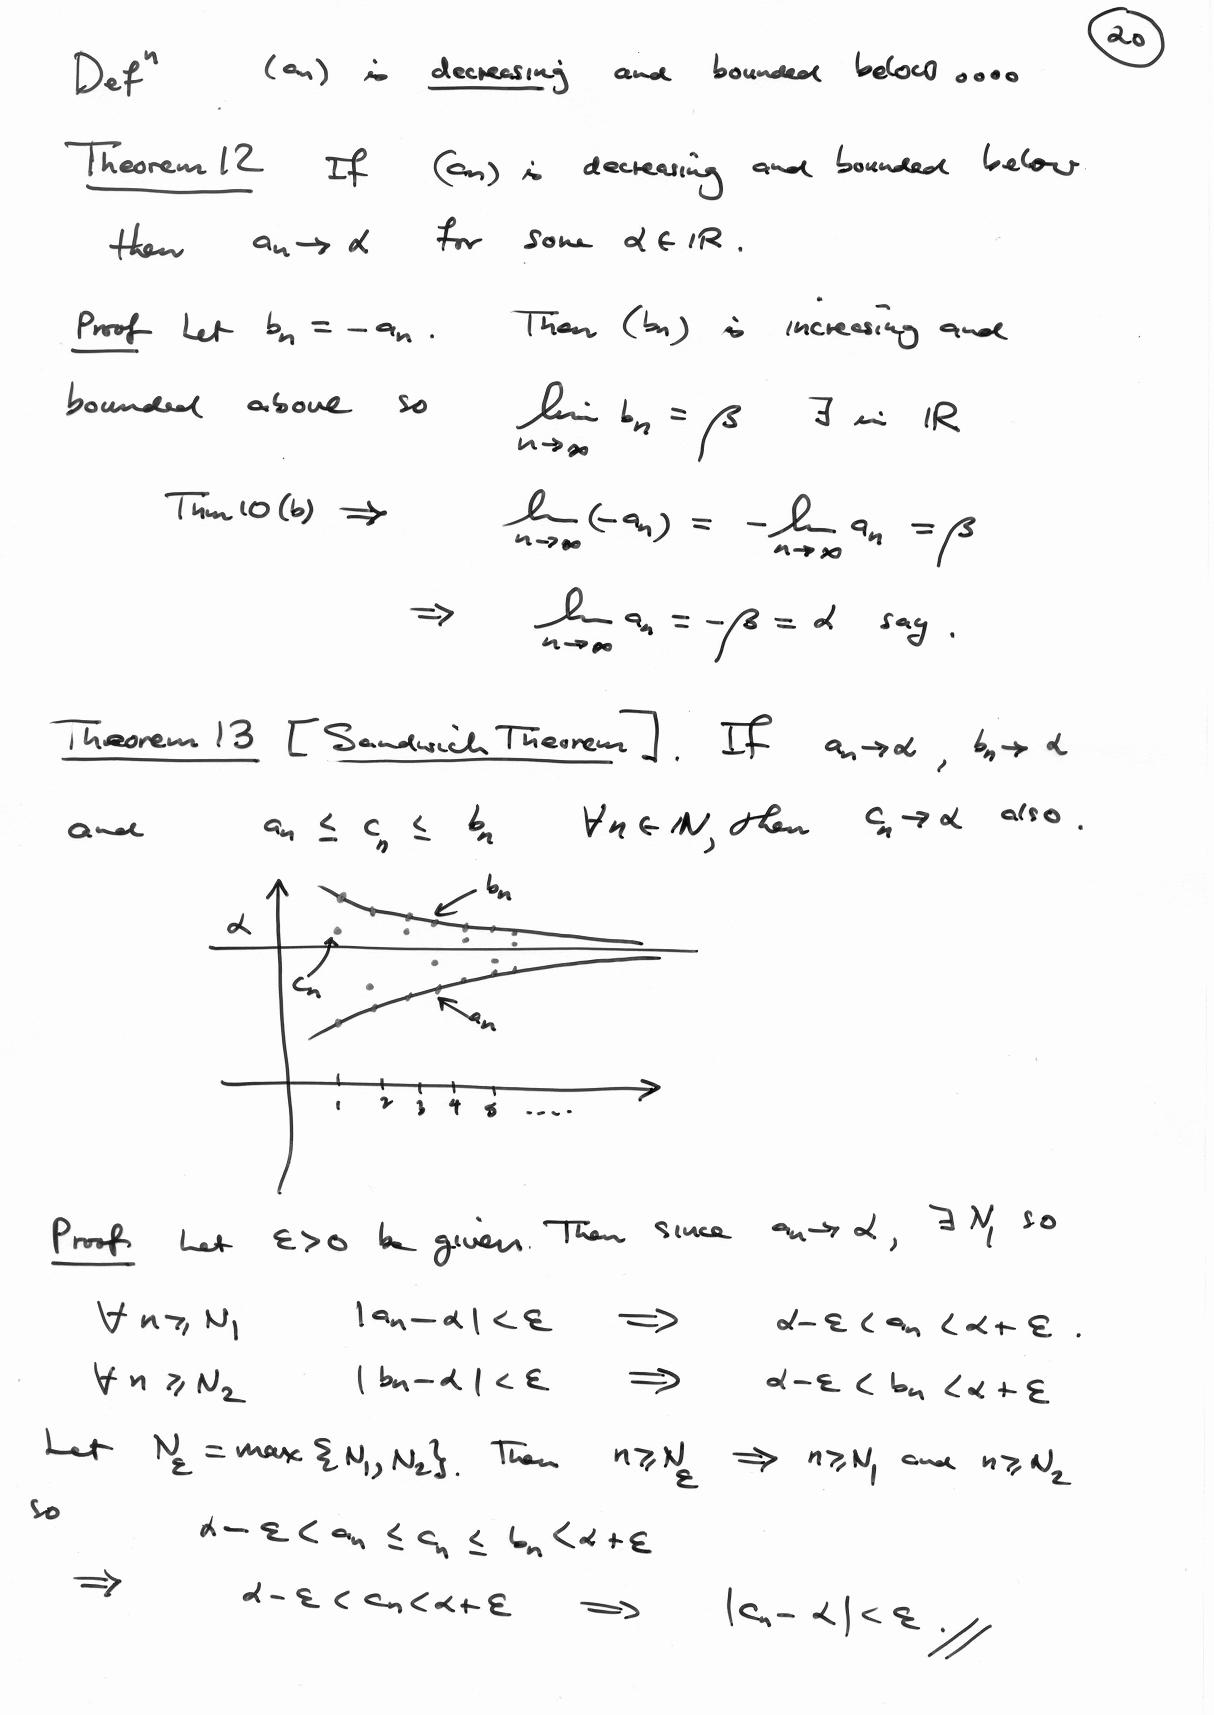 Intermediate Value theorem Worksheet Elegant Elements Of Analysis and Algebra Part A